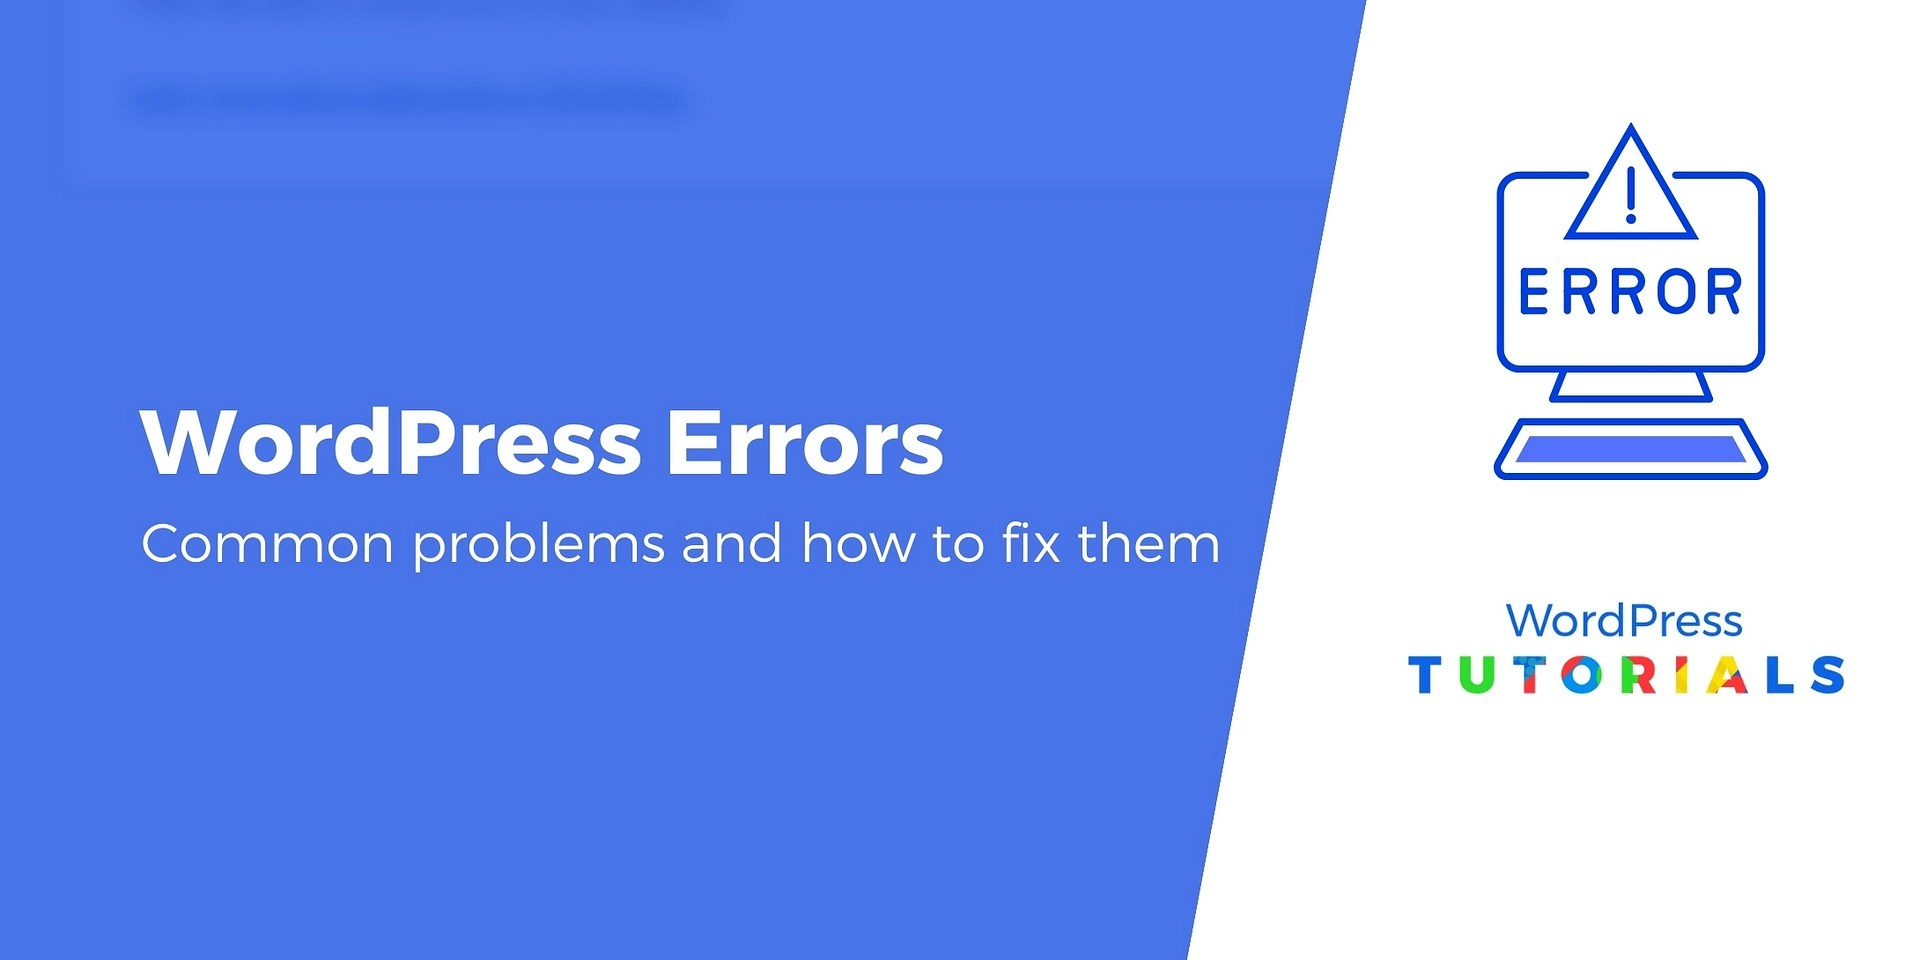 20 Common WordPress Errors and How to Fix Them